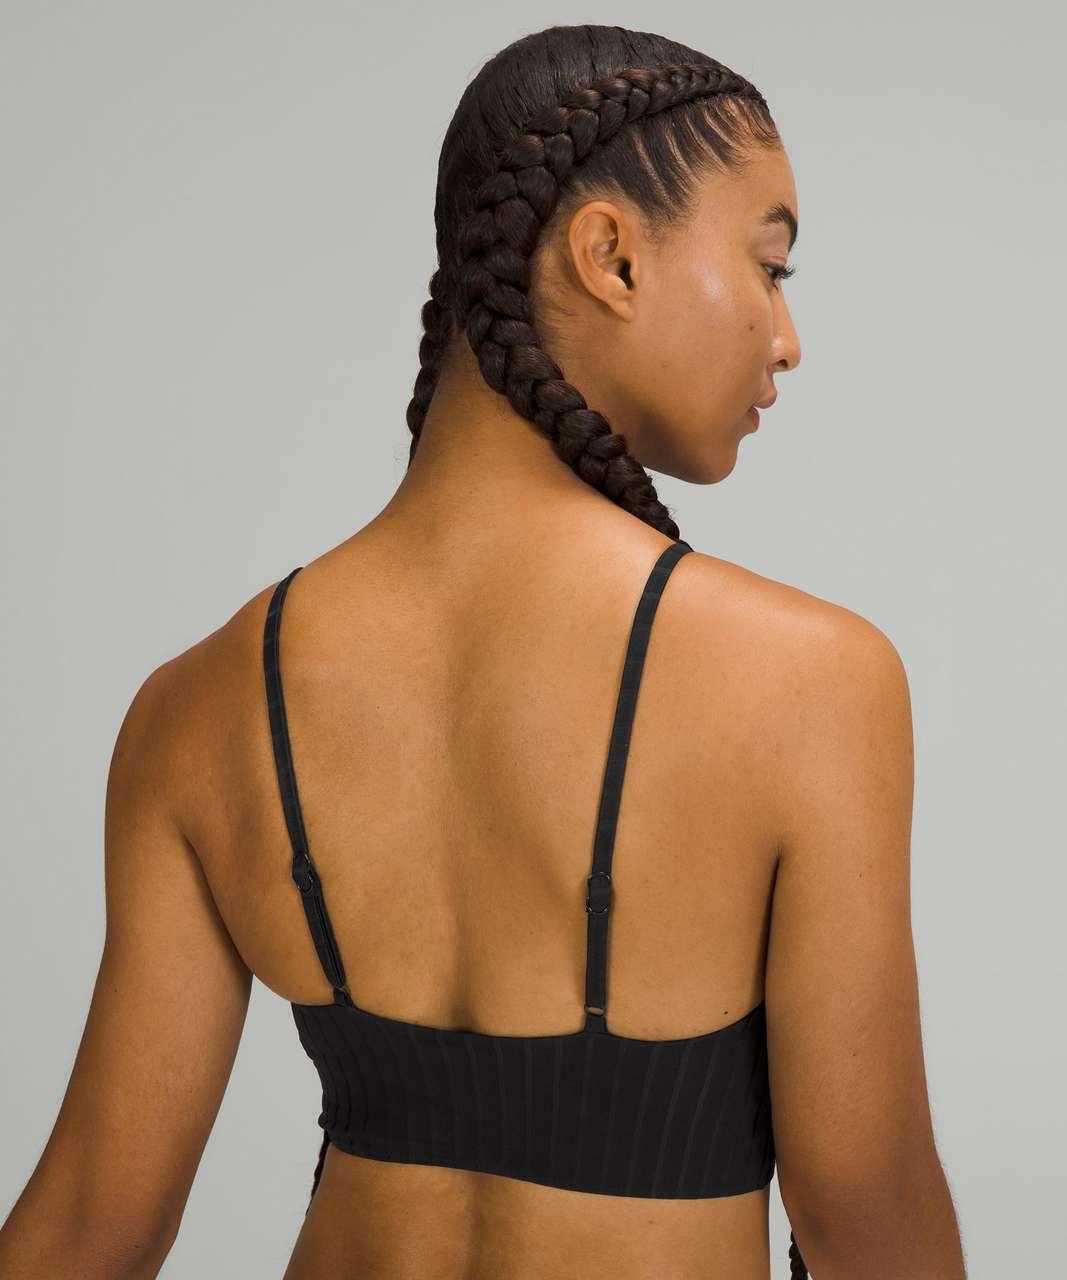 Lululemon Ribbed High-Neck Long-Line Top *B/C Cups - Black